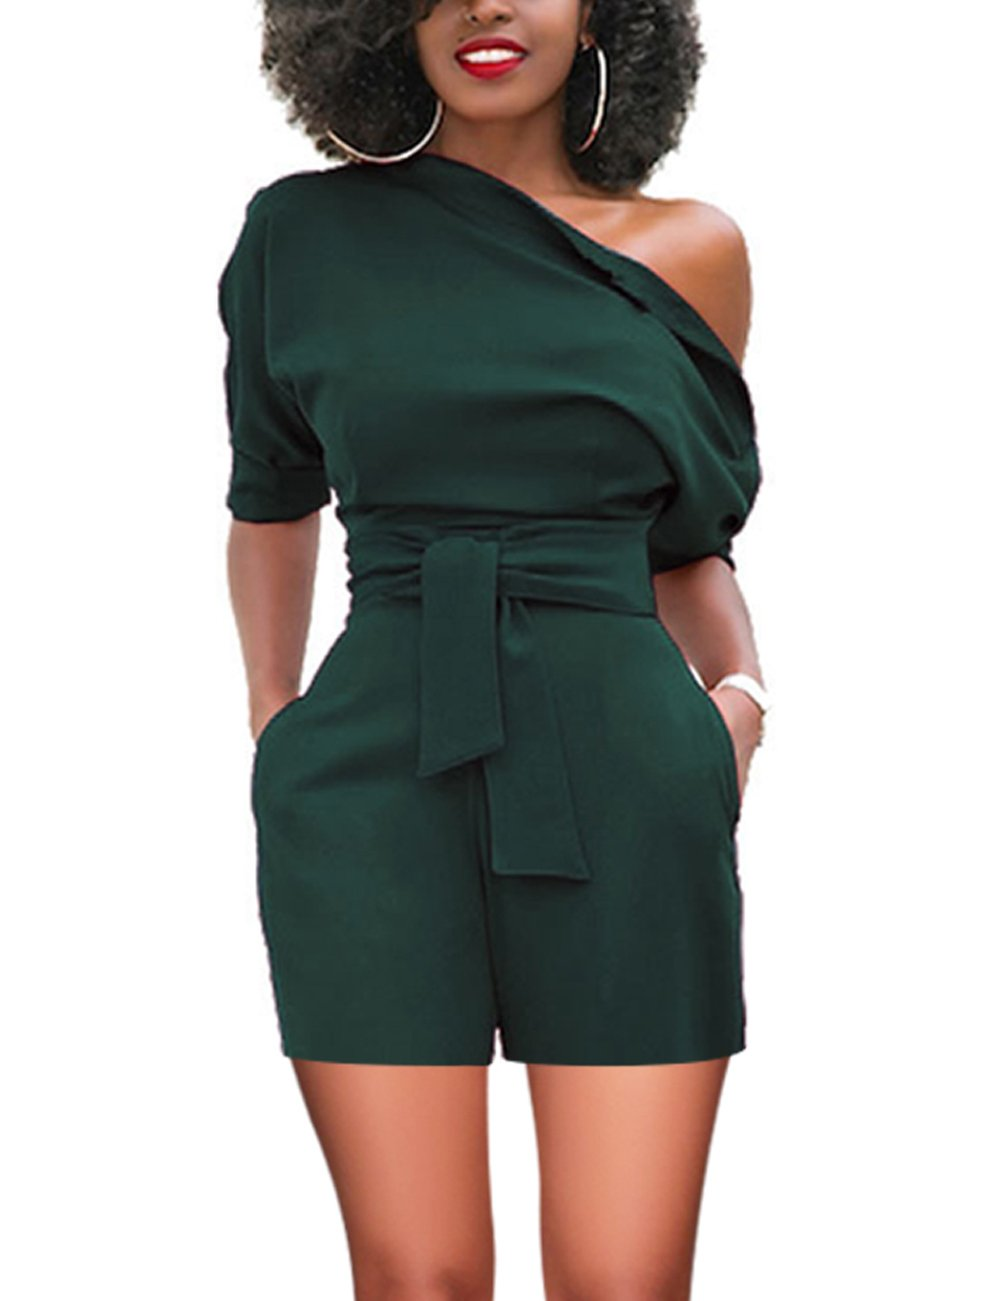 Vilover Women's Sexy Off Shoulder Ruffle Short Romper Jumpsuit (XL, Green#)